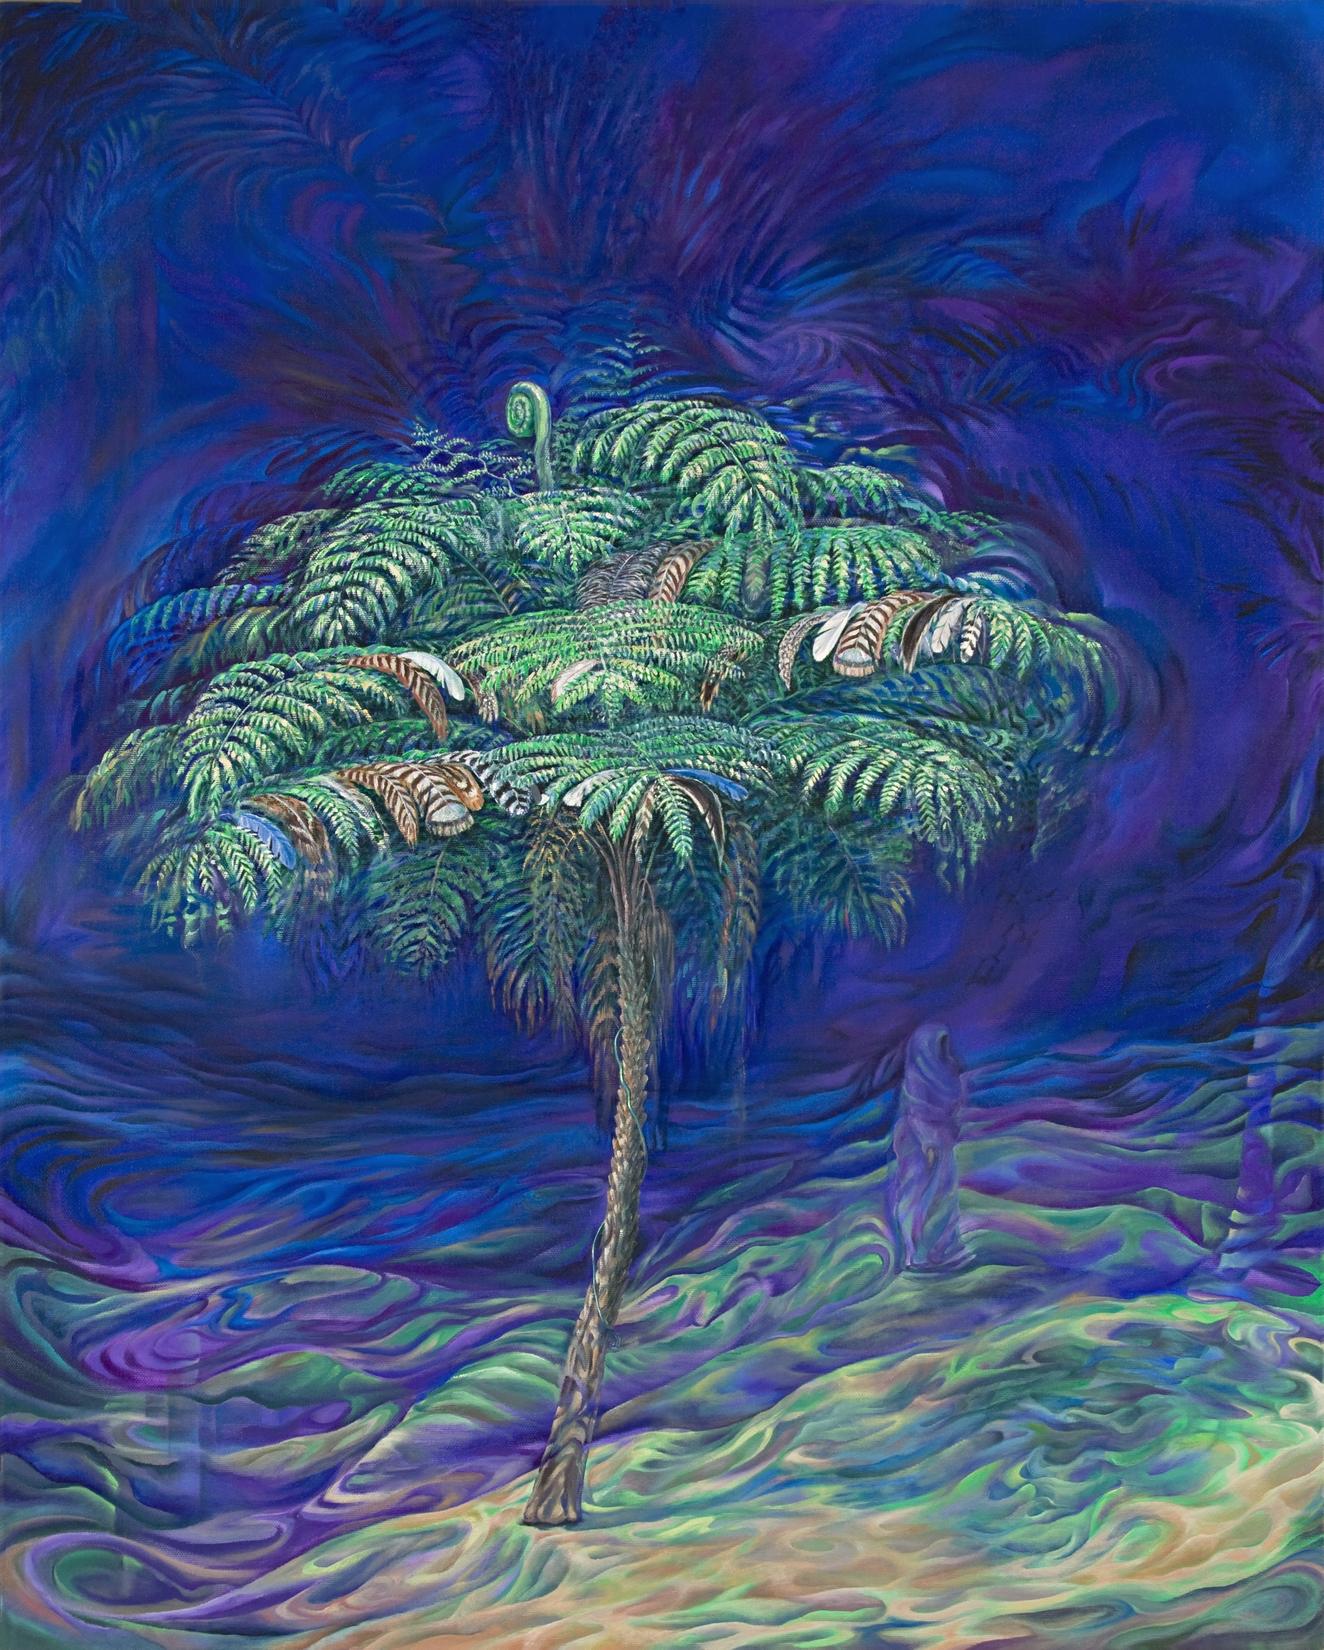 Shy Telepathic Treefern Model - oil on canvas, 30 x 24